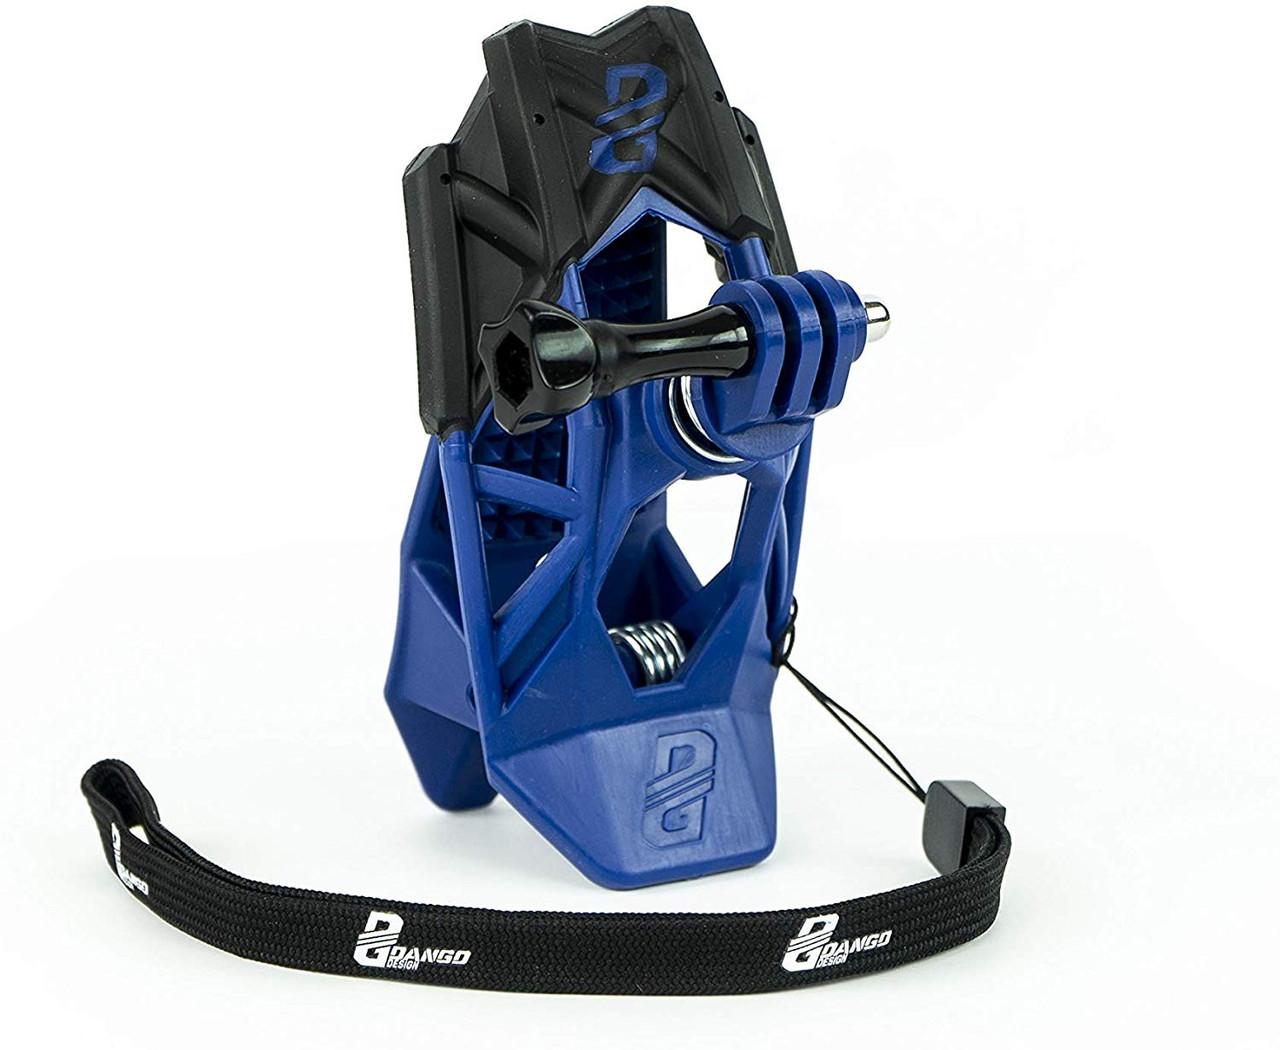 DANGO GRIPPER MOUNT suits all Go Pro Cameras - Blue